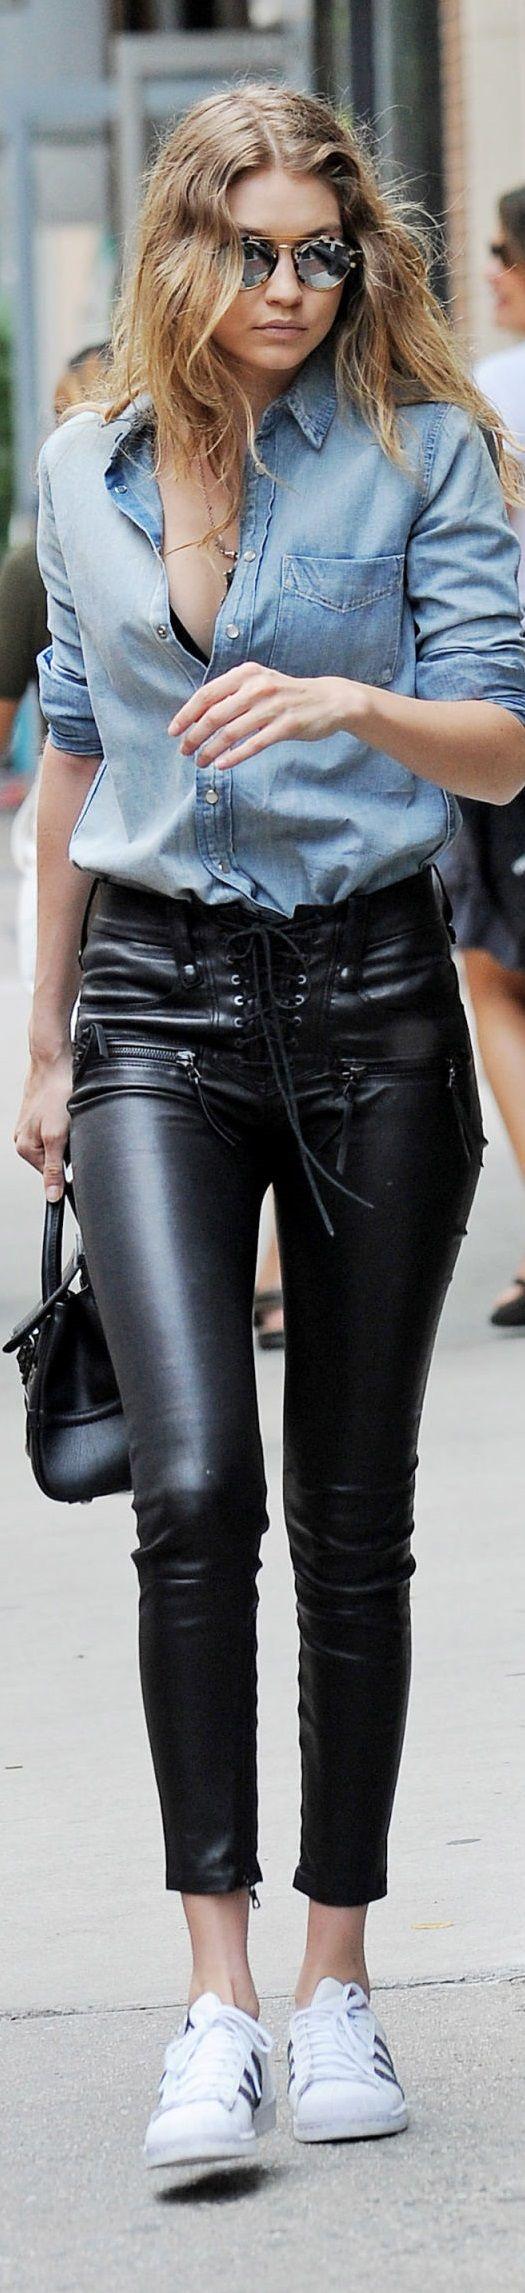 Gigi Hadid denim shirt and leather pants